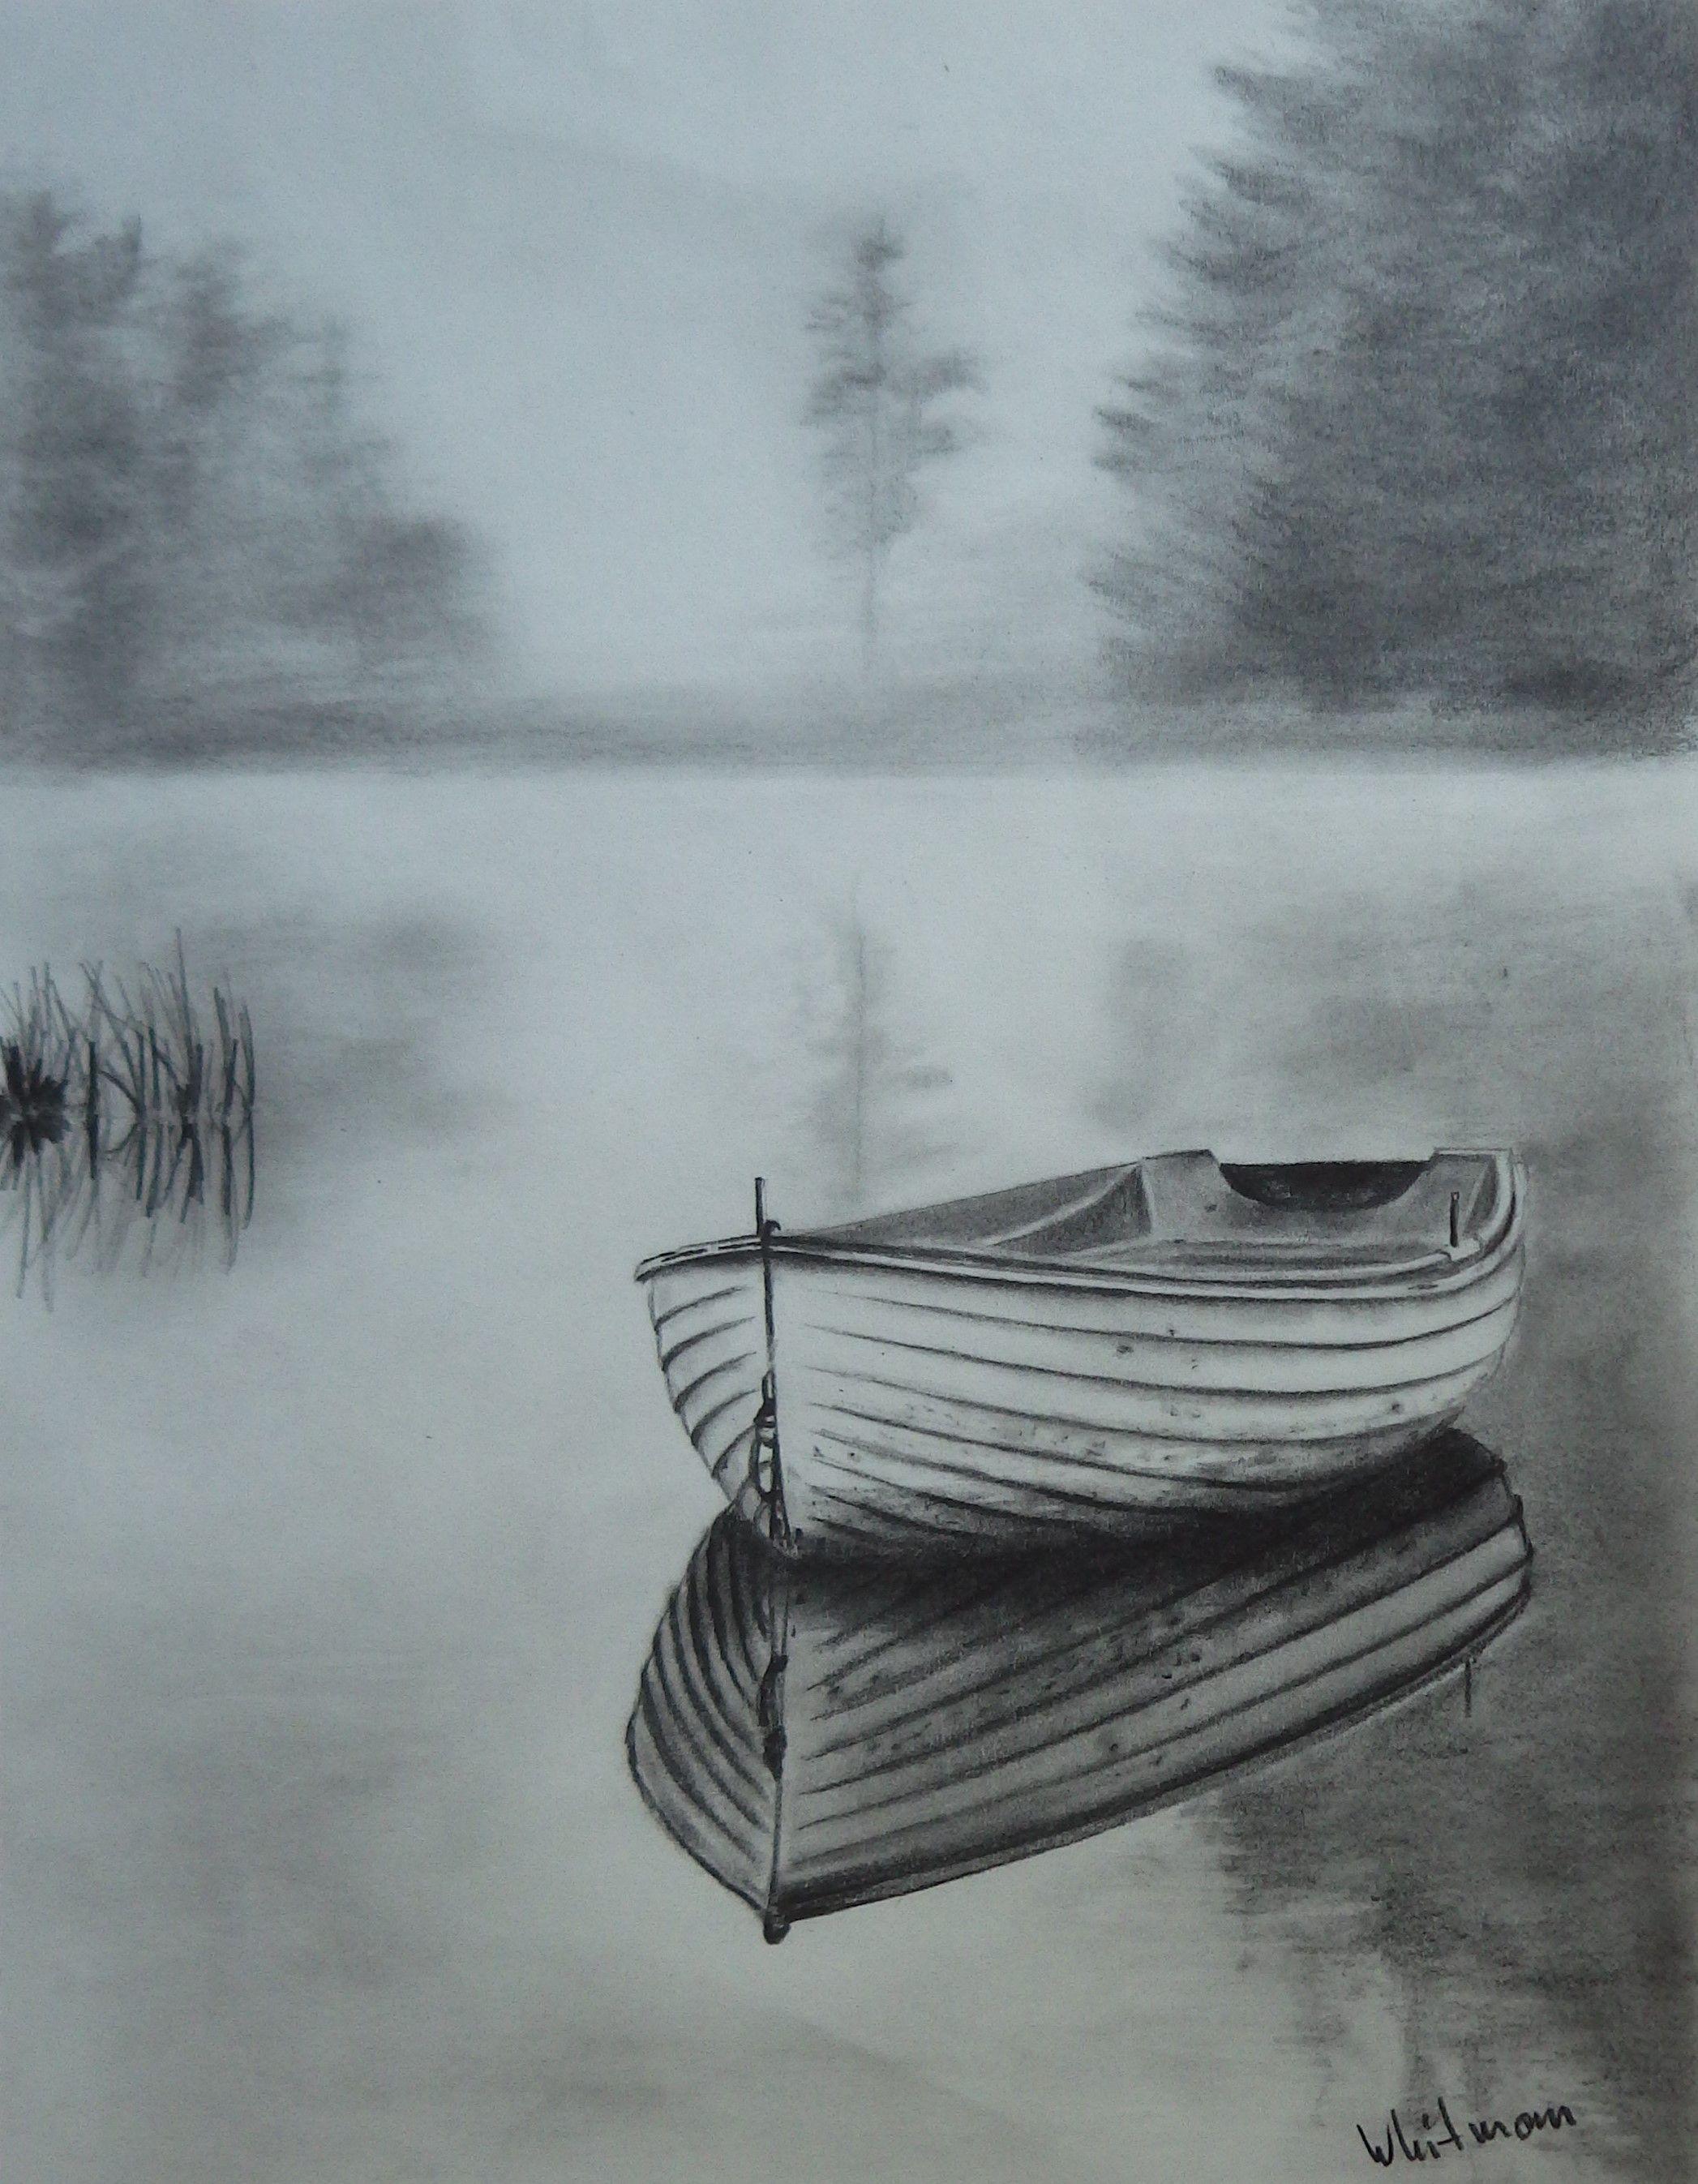 2094x2693 Misty Row Boat Sketch, Water Reflections. Original Art, Graphite